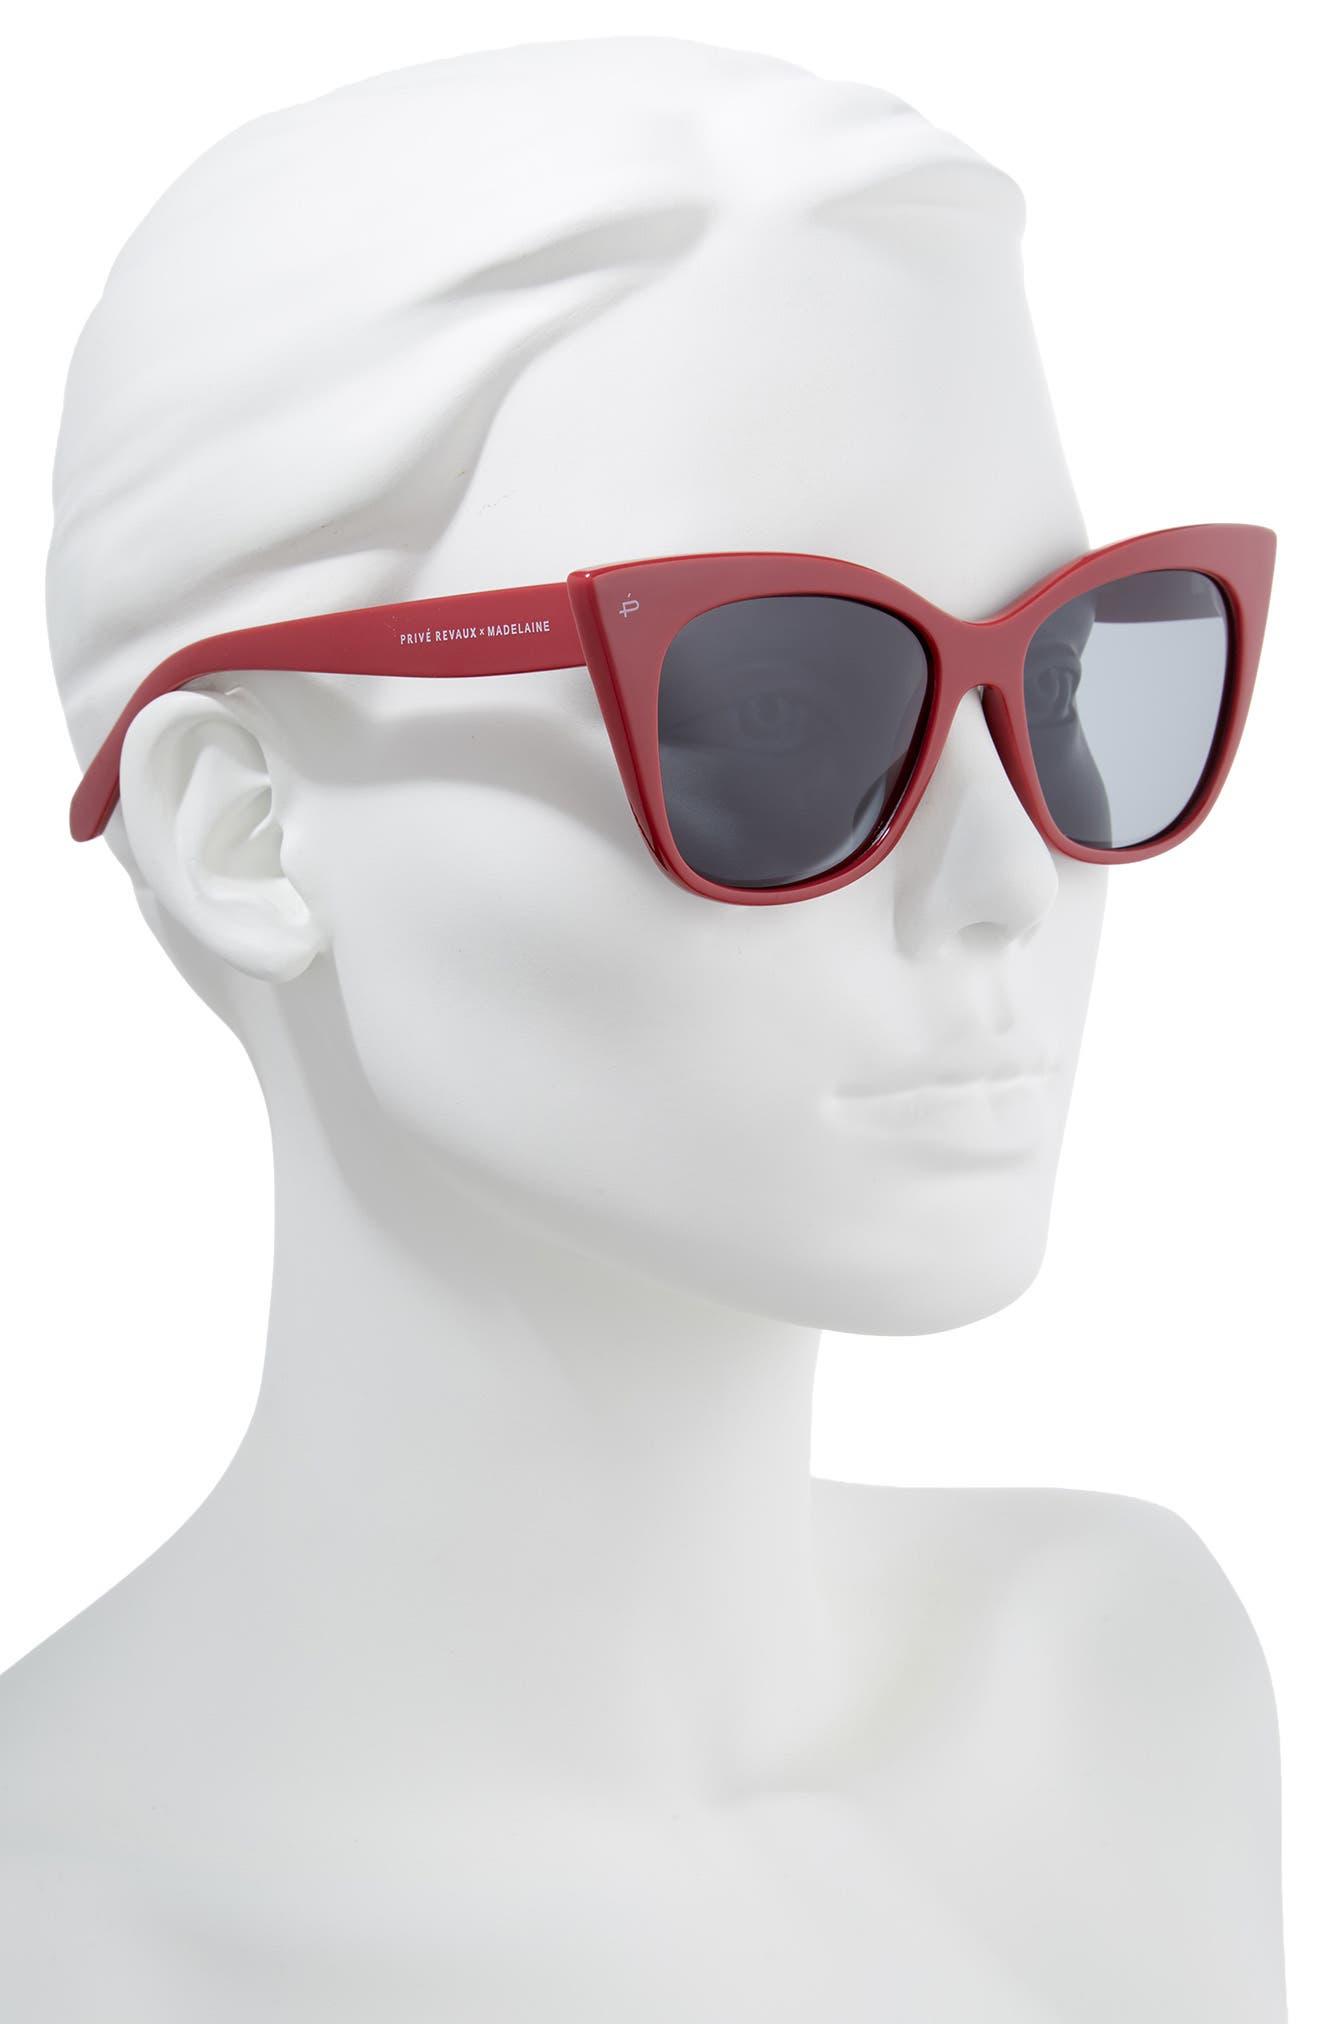 Privé Revaux x Madelaine Petsch The Mister 54mm Cat Eye Sunglasses,                             Alternate thumbnail 3, color,                             Red/ Black